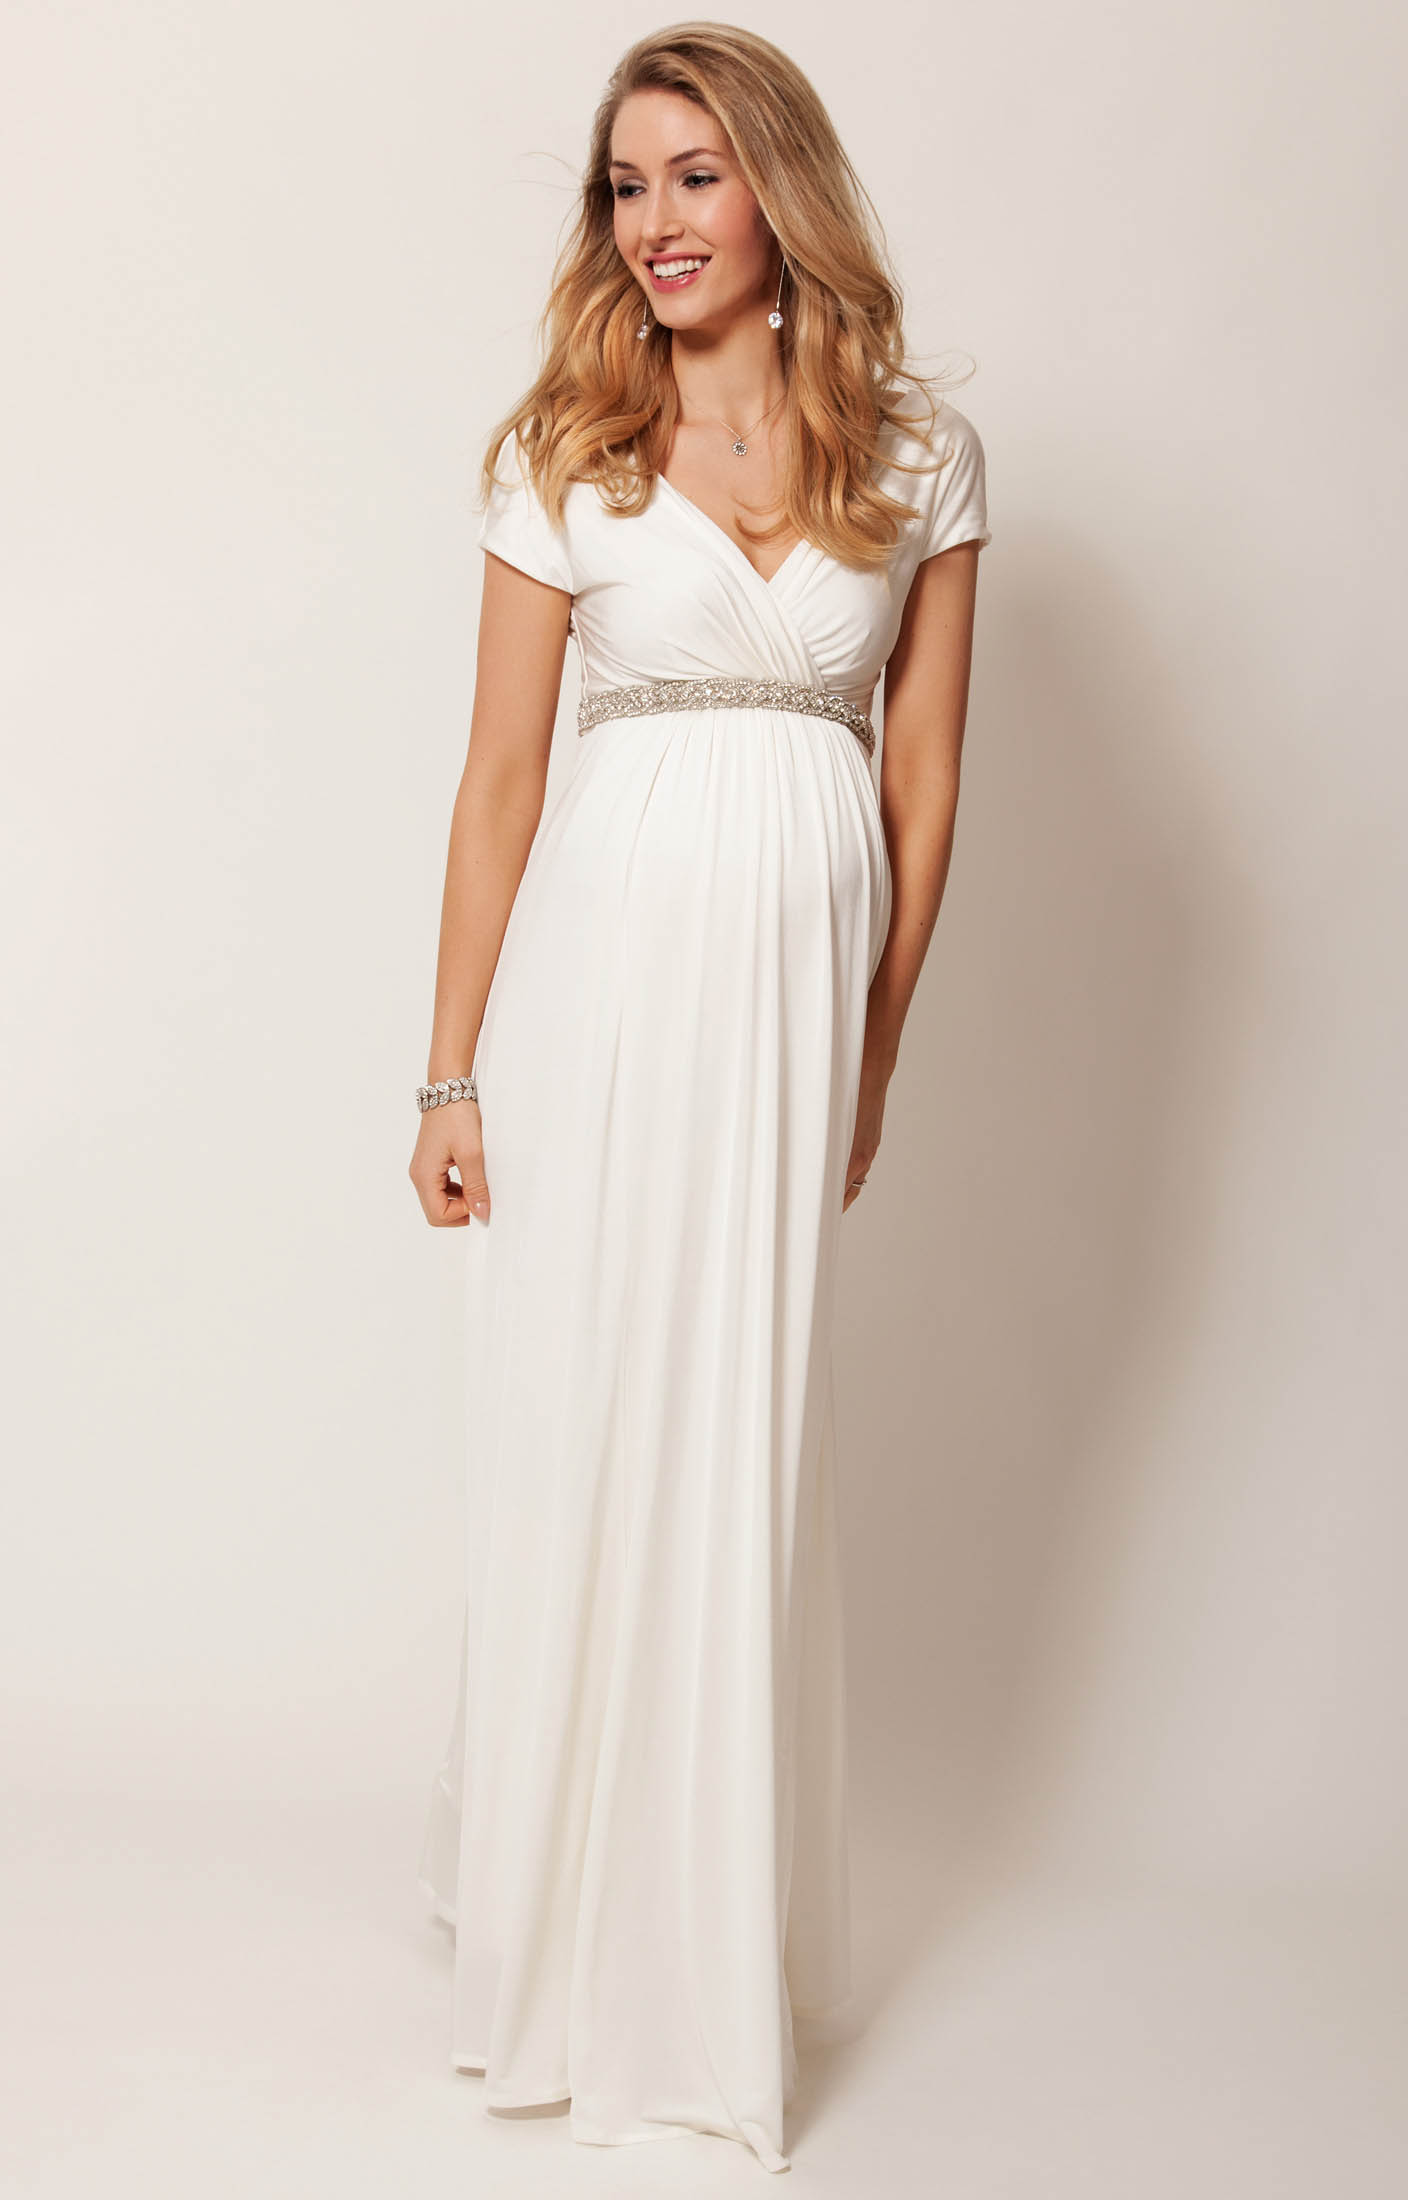 Where to buy maternity wedding dresses